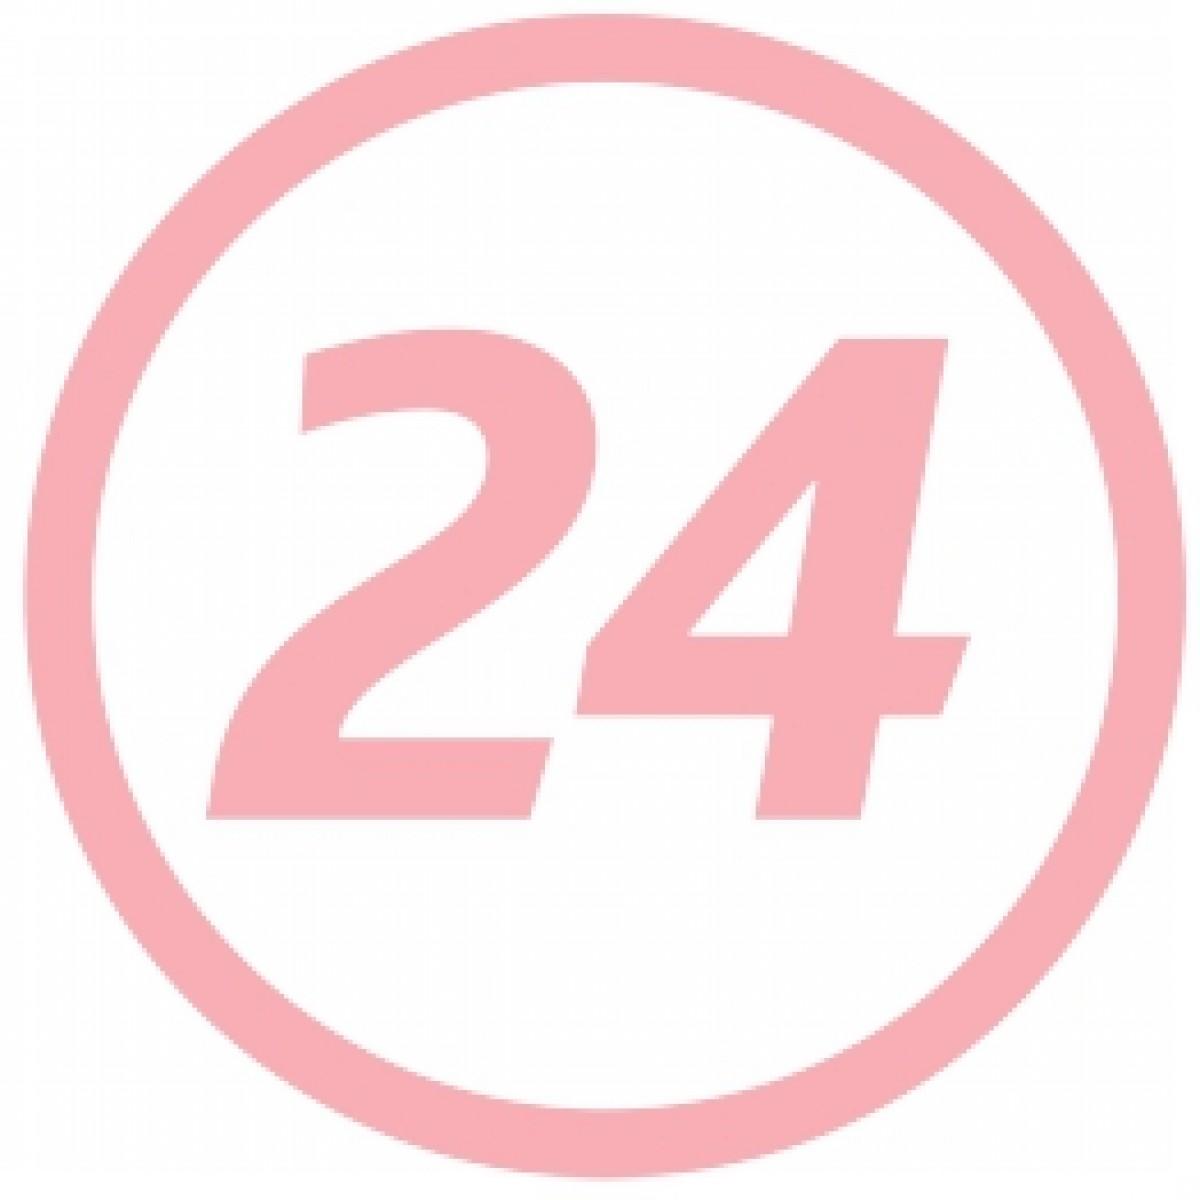 Ducray A-Derma Exomega Control Balsam Emolient, Balsam, 200ml